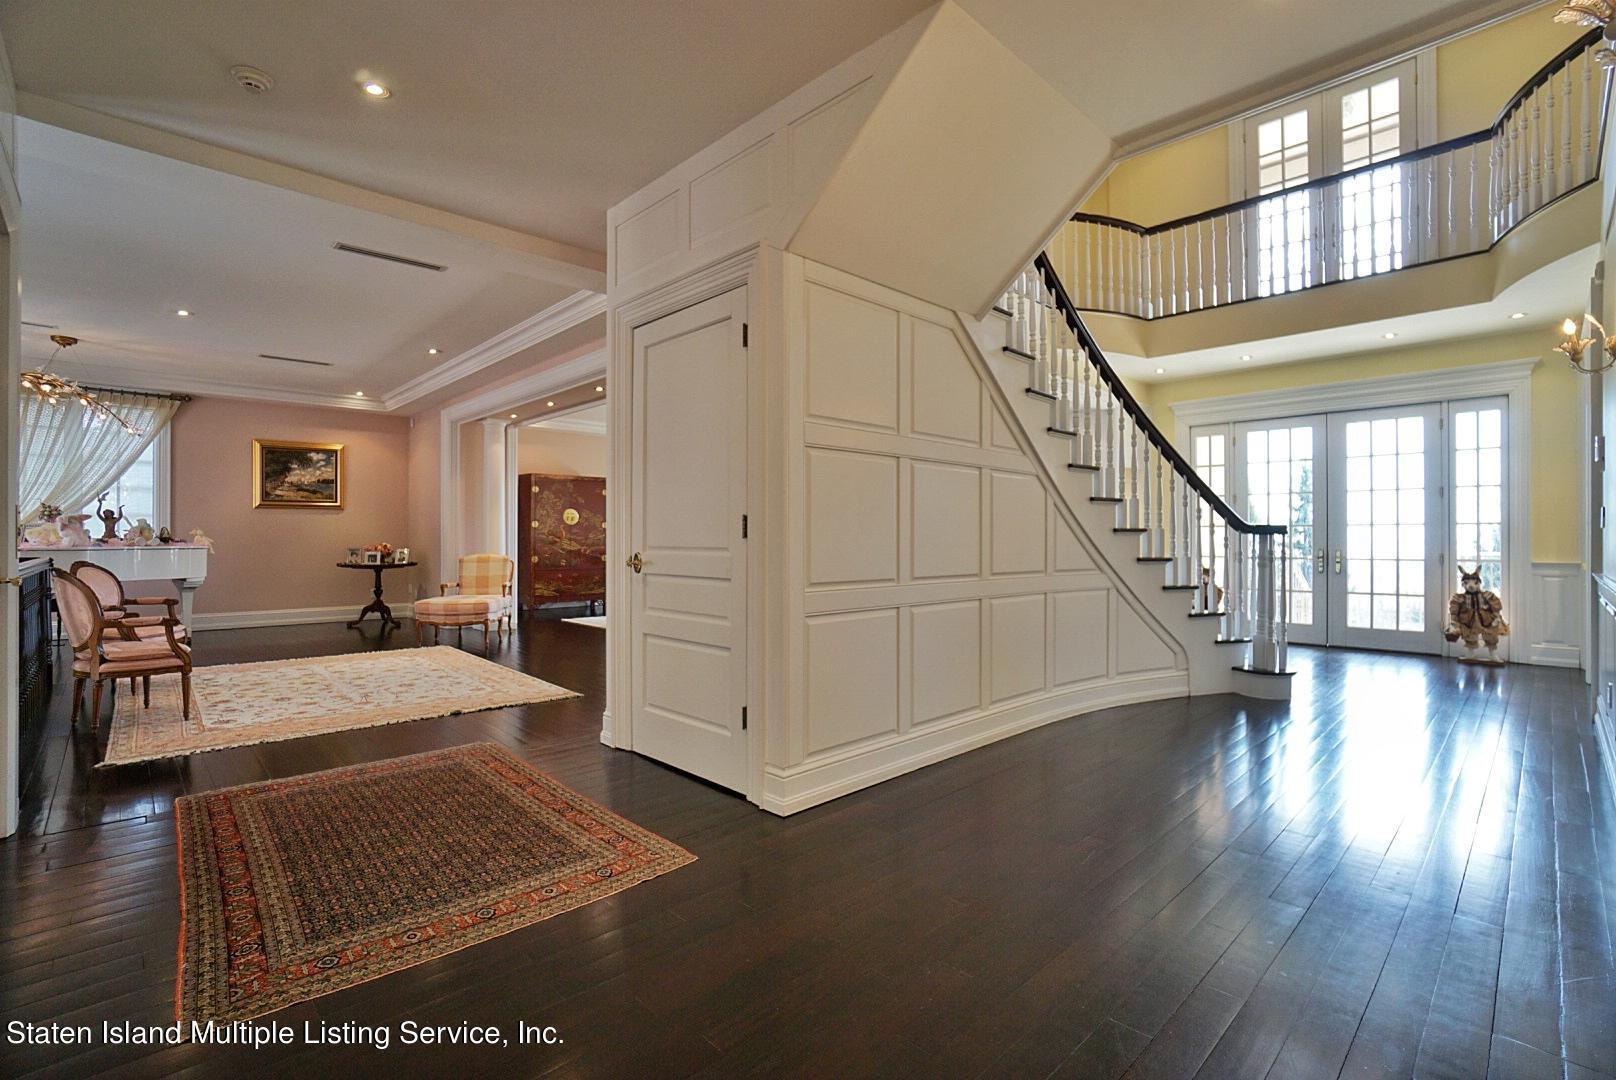 Single Family - Detached 129 Coverly Avenue   Staten Island, NY 10301, MLS-1144490-11